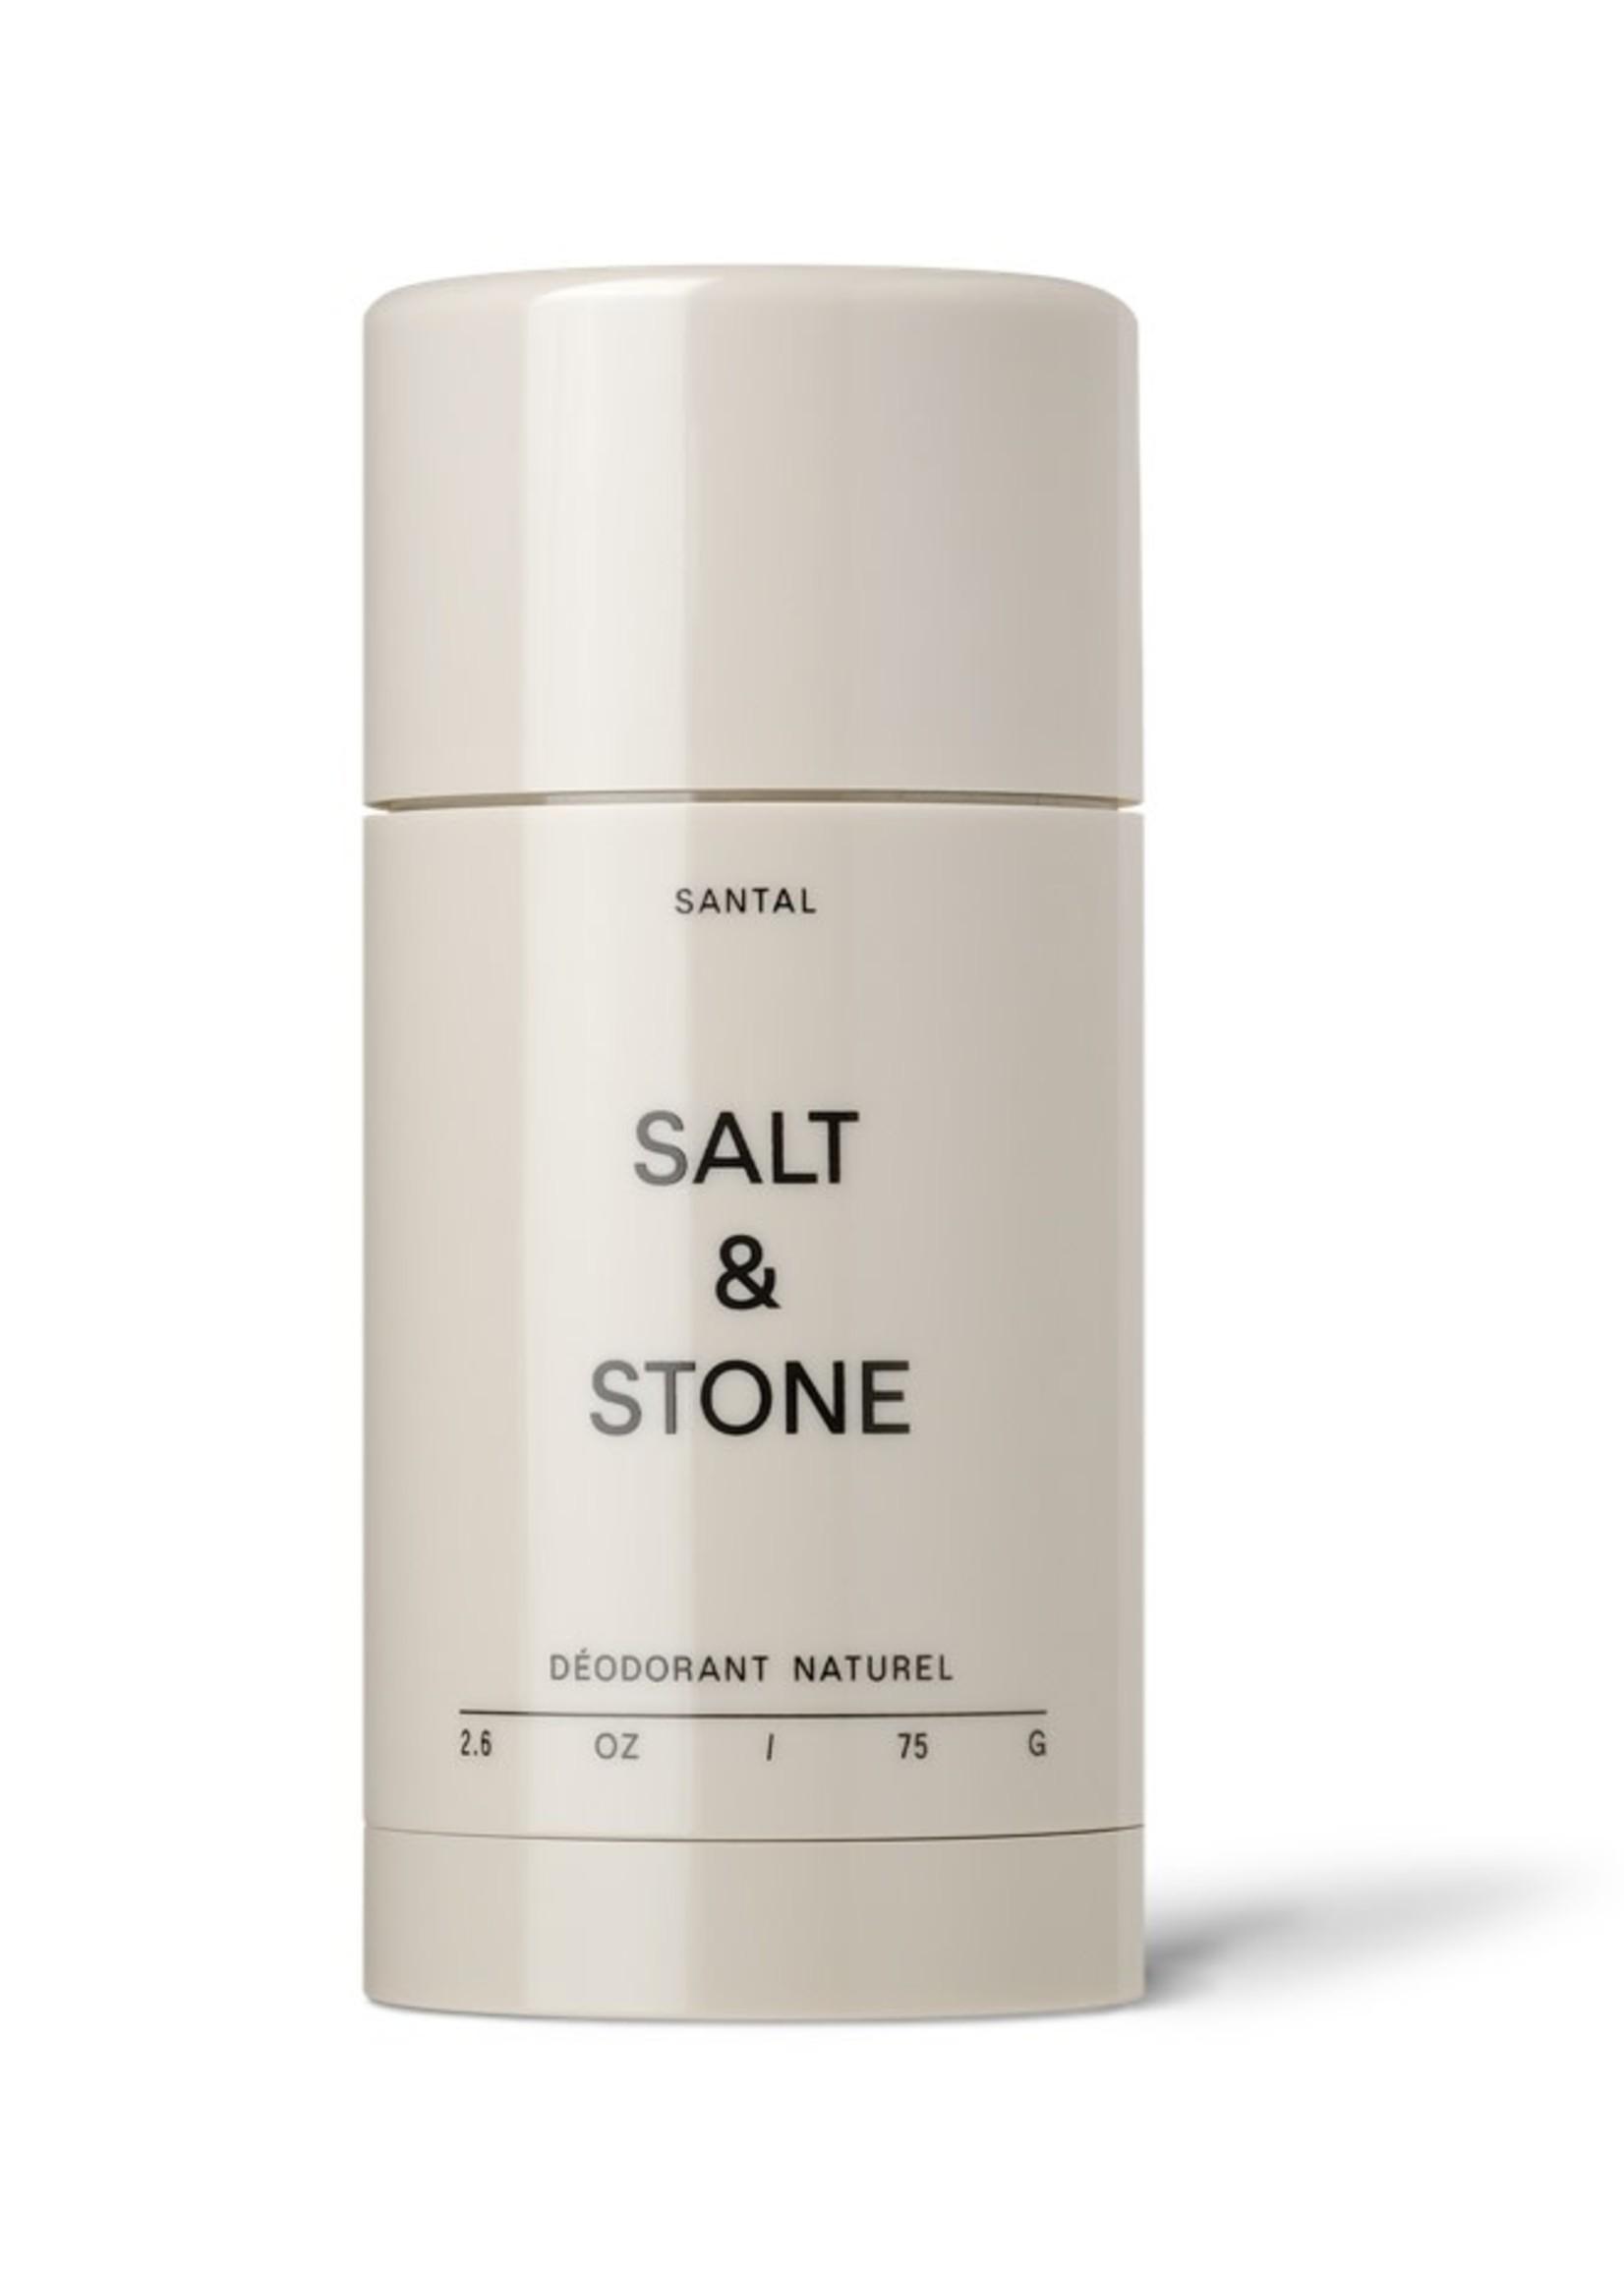 SALT & STONE Santal Natural Deodorant